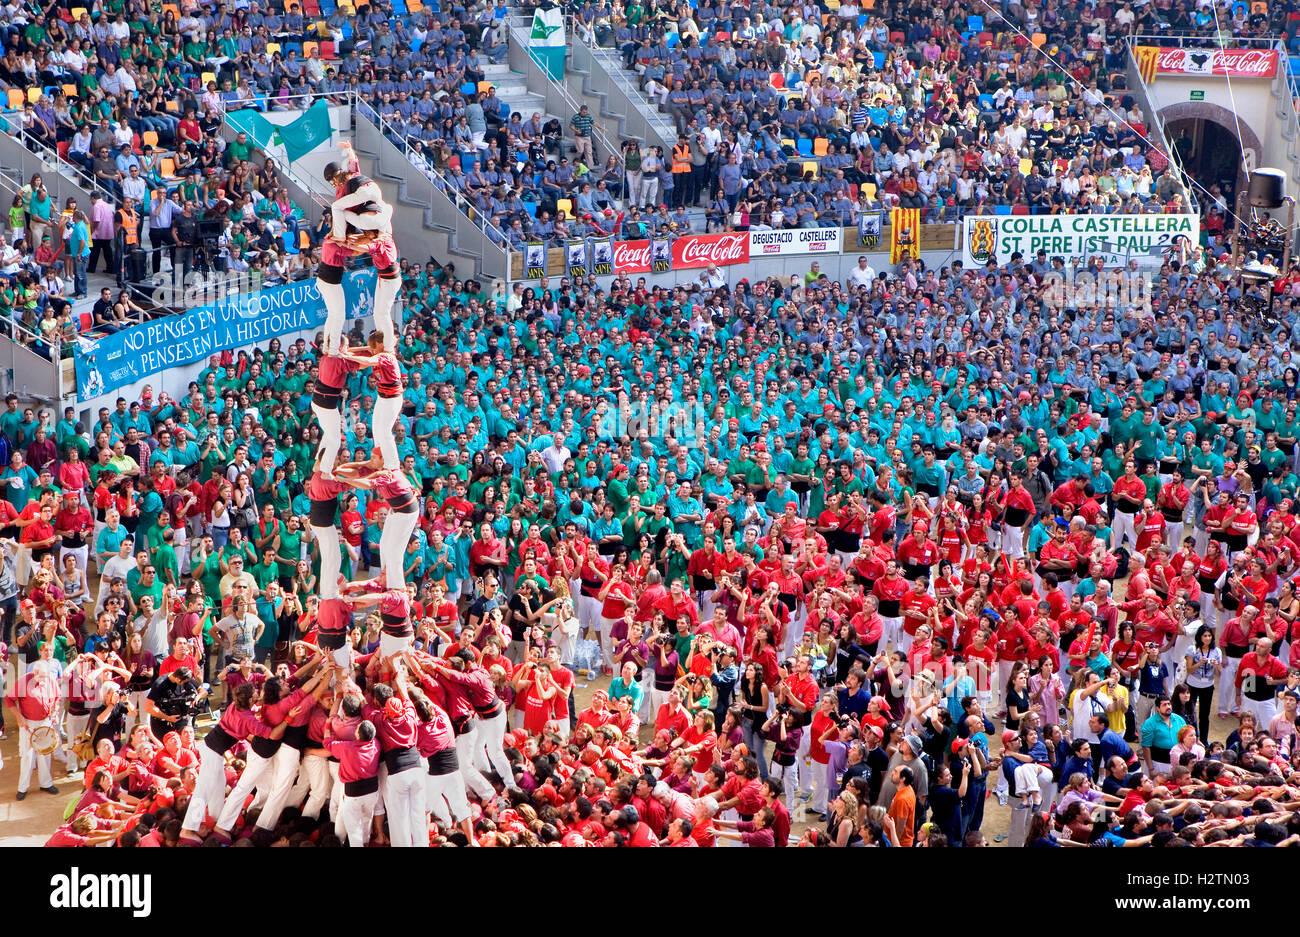 Castellers de Lleida.'Castellers' building human tower, a Catalan tradition.Biannual contest. bullring.Tarragona, - Stock Image